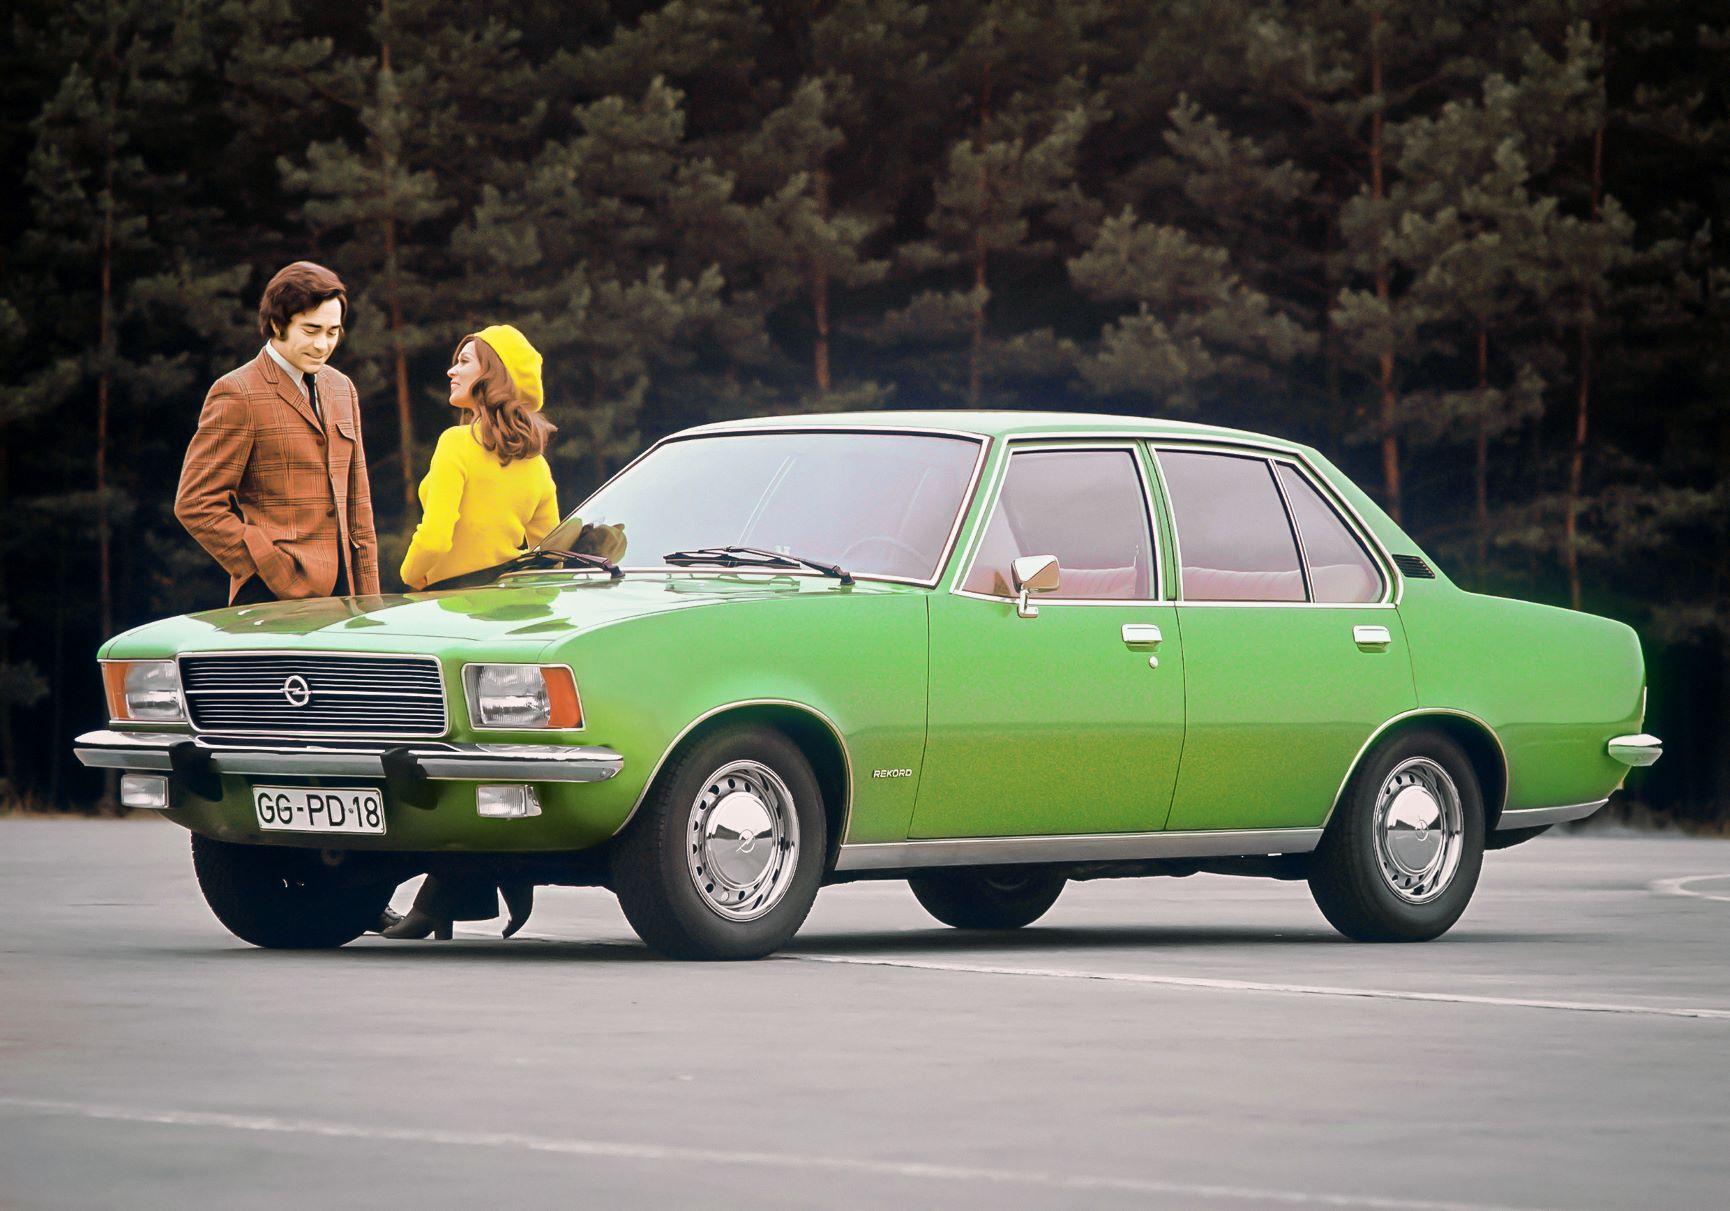 Opel Rekord D modelo emblemático de Rüsselsheim celebra 50 anos 13